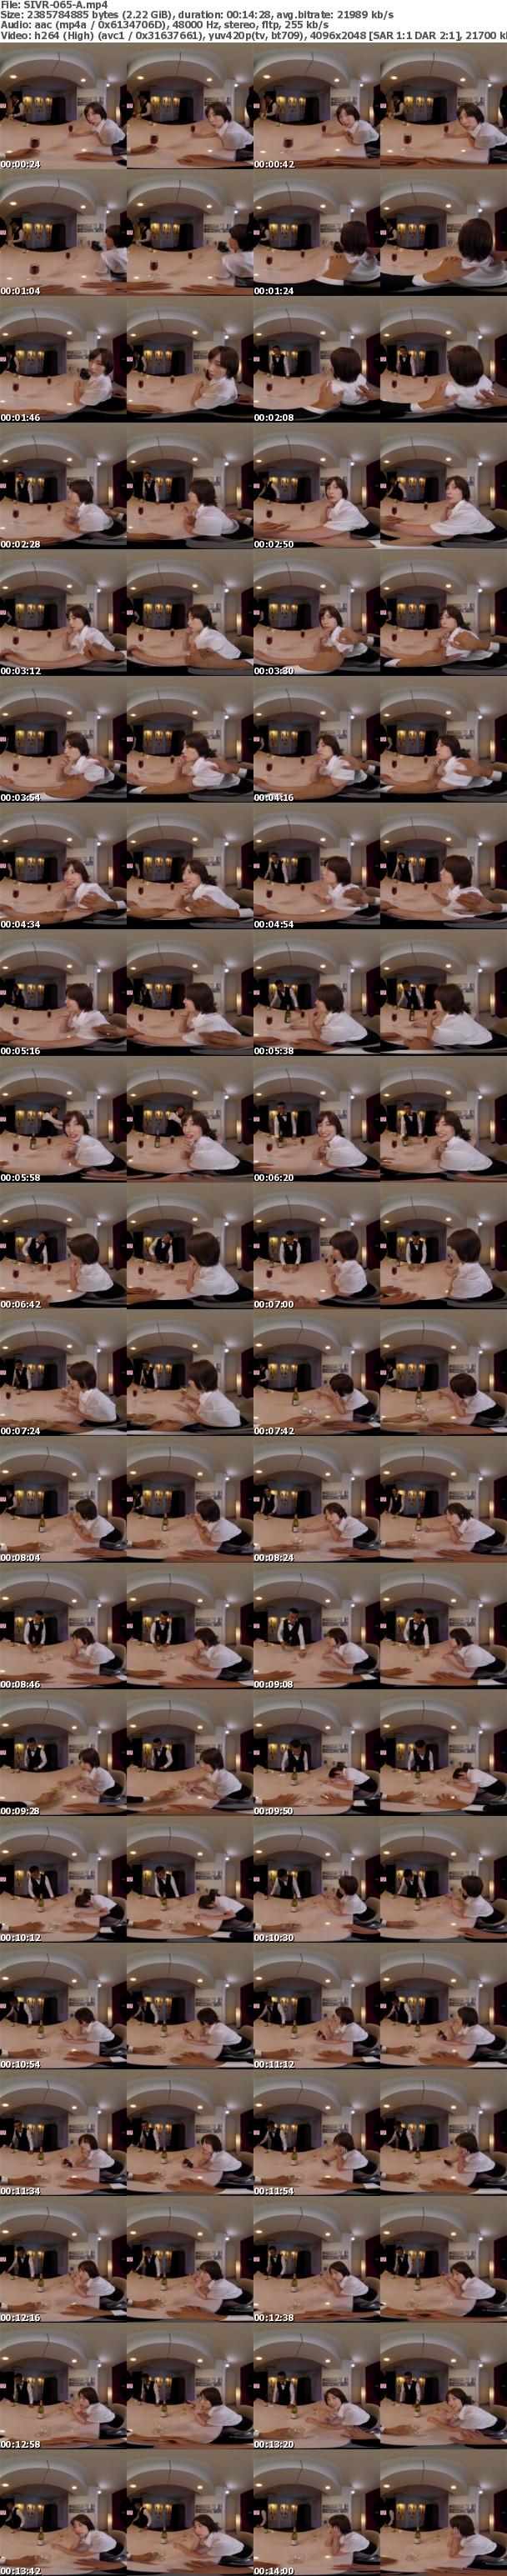 (VR) SIVR-065 女上司と相部屋VR 無防備な上司の姿に性欲のタガが外れて一晩中ヤリまくった一部始終 奥田咲